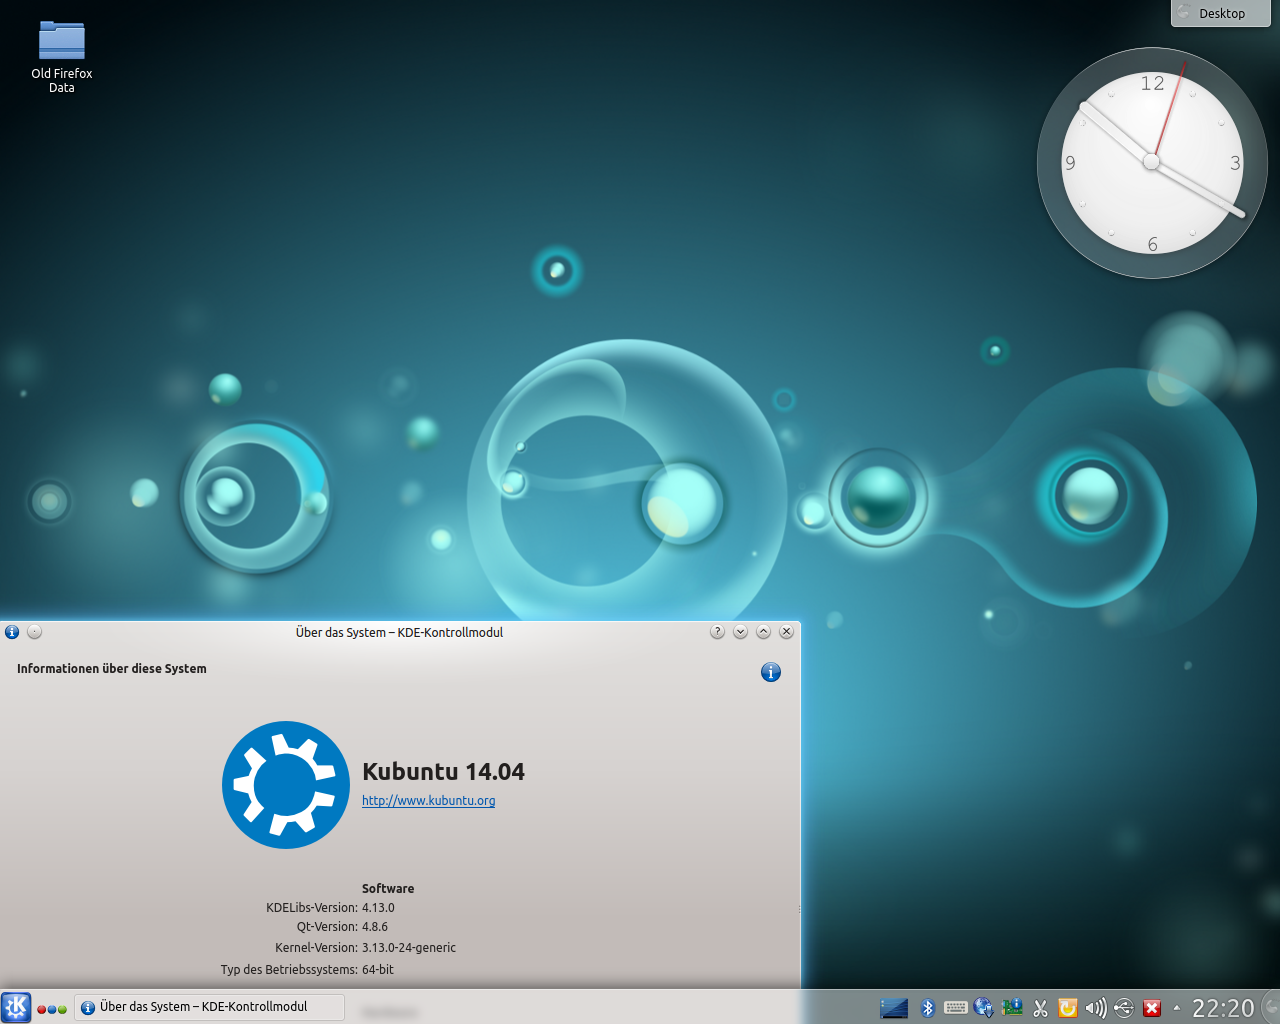 Kubuntu 14.04